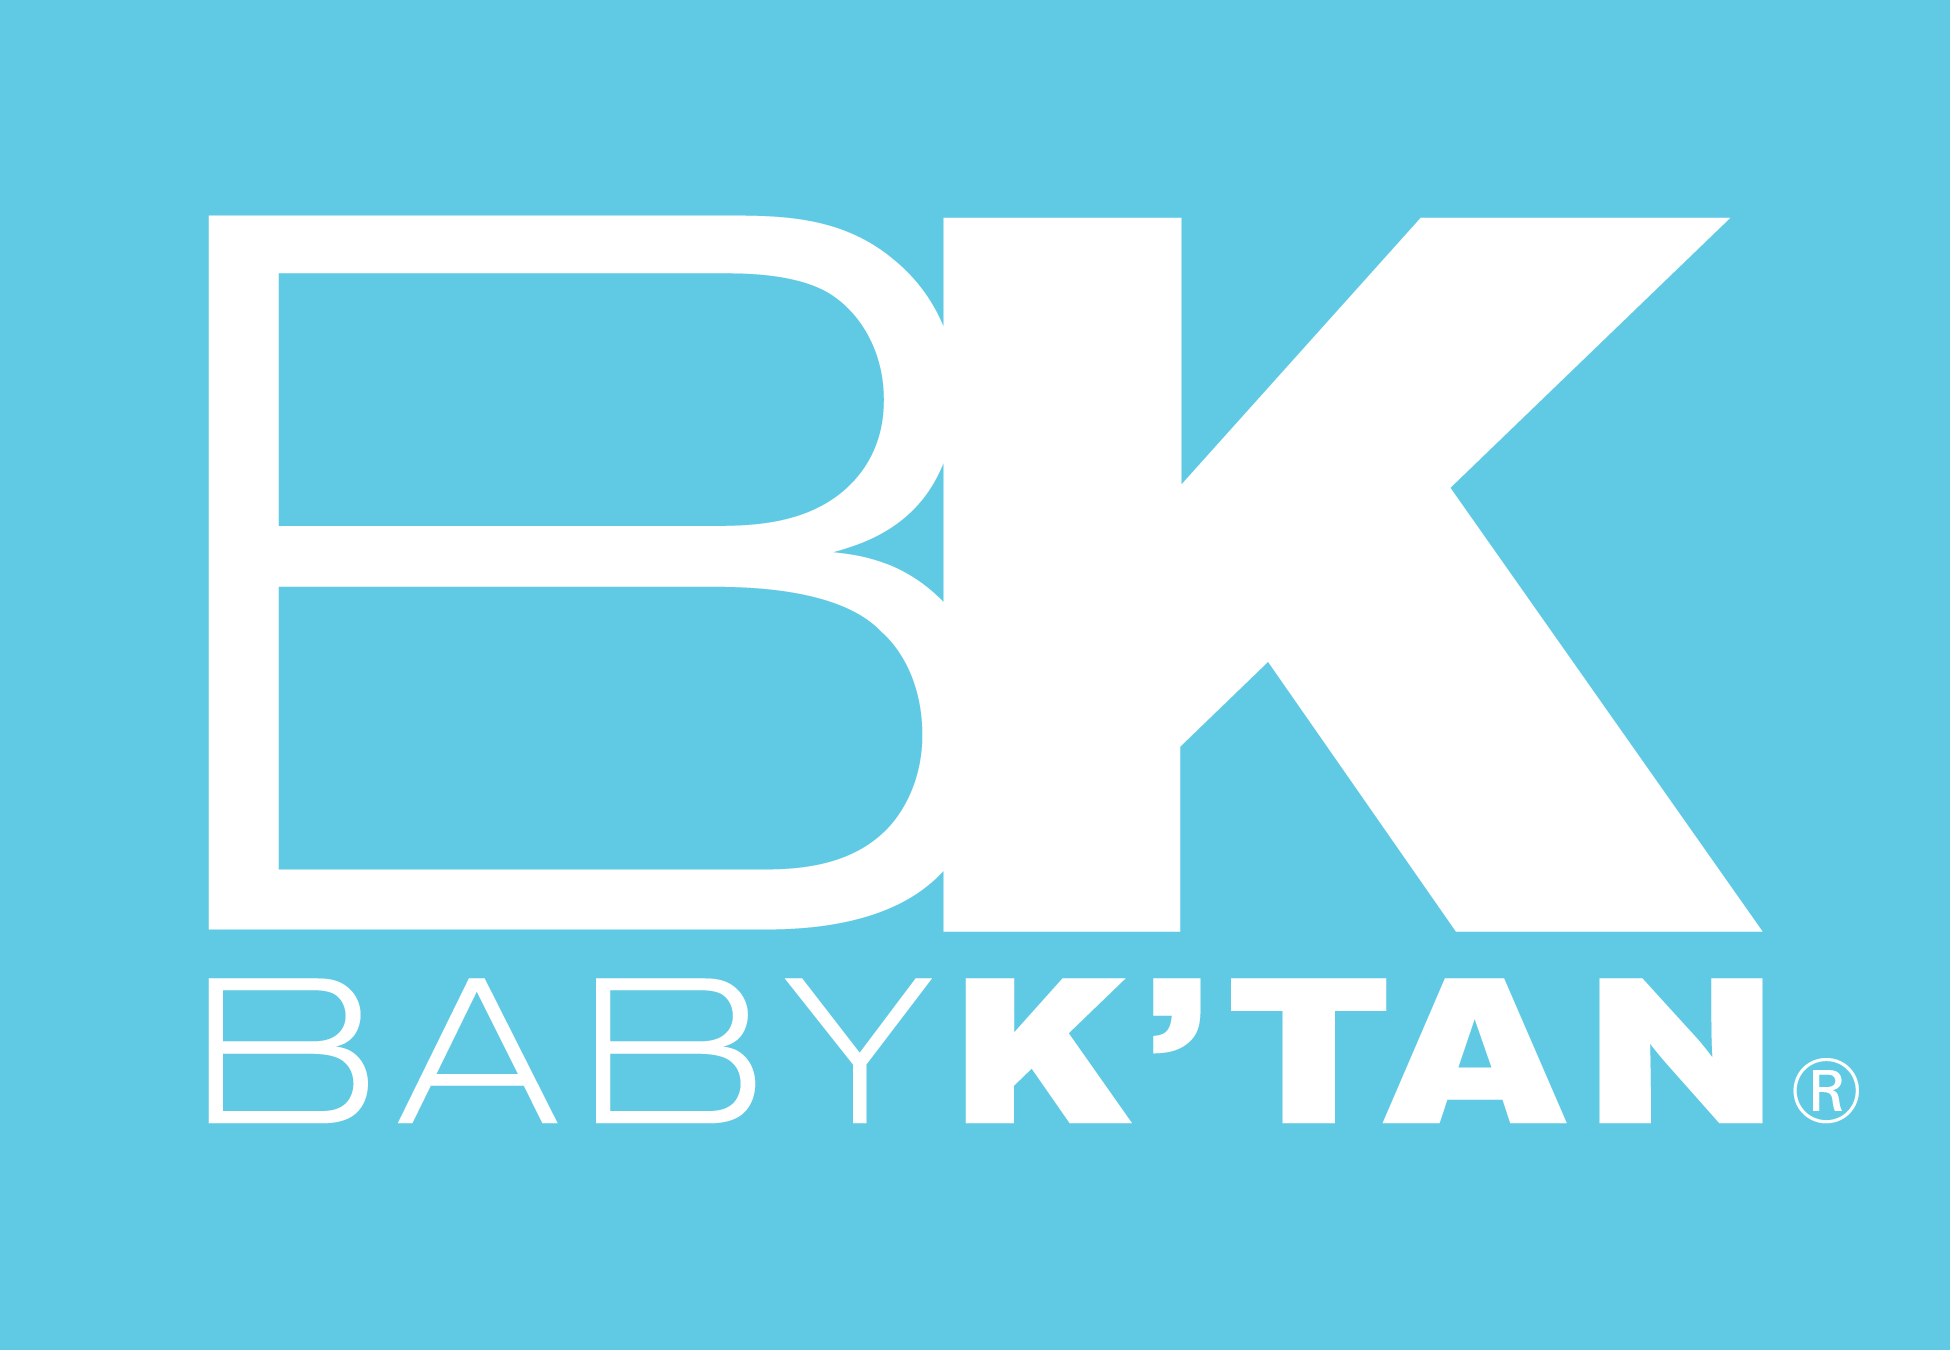 babyktan Logo